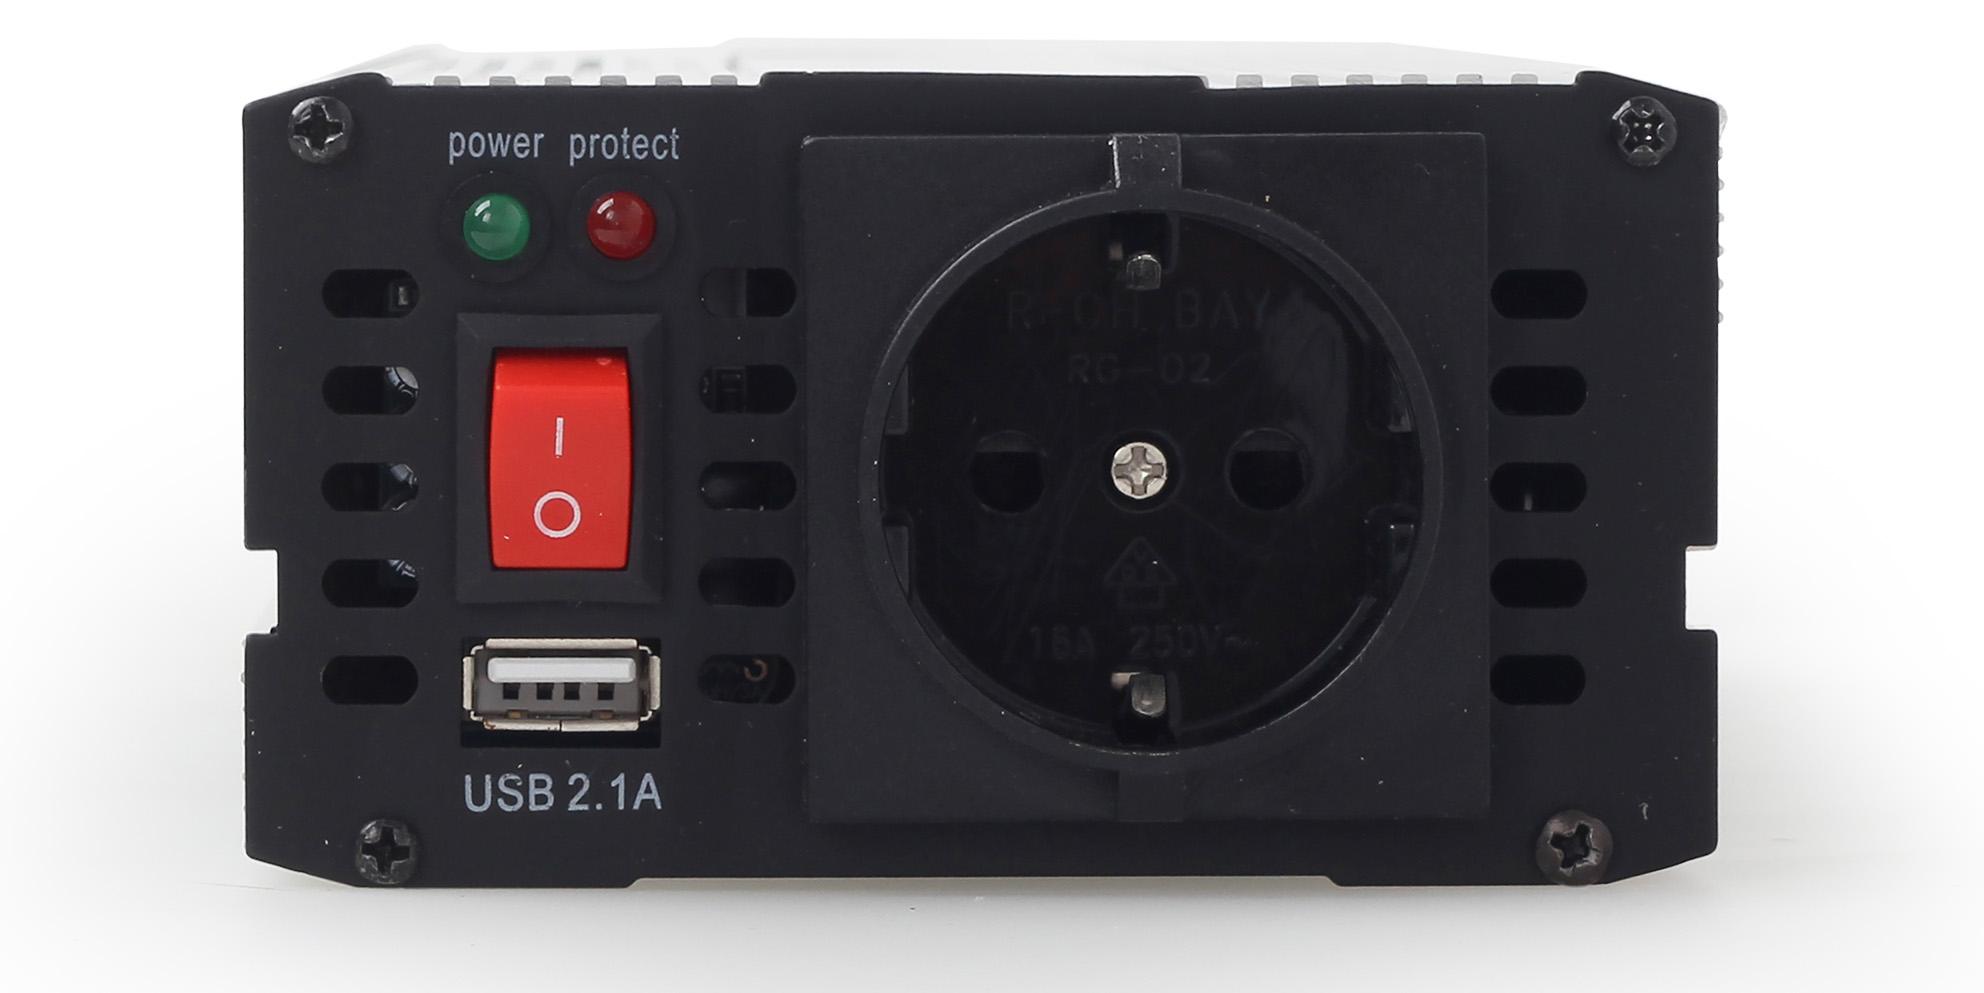 Автомобильный инвертор 12V/220V 500 ВТ ENERGENIE (EG-PWC-043) Energenie - фото 4